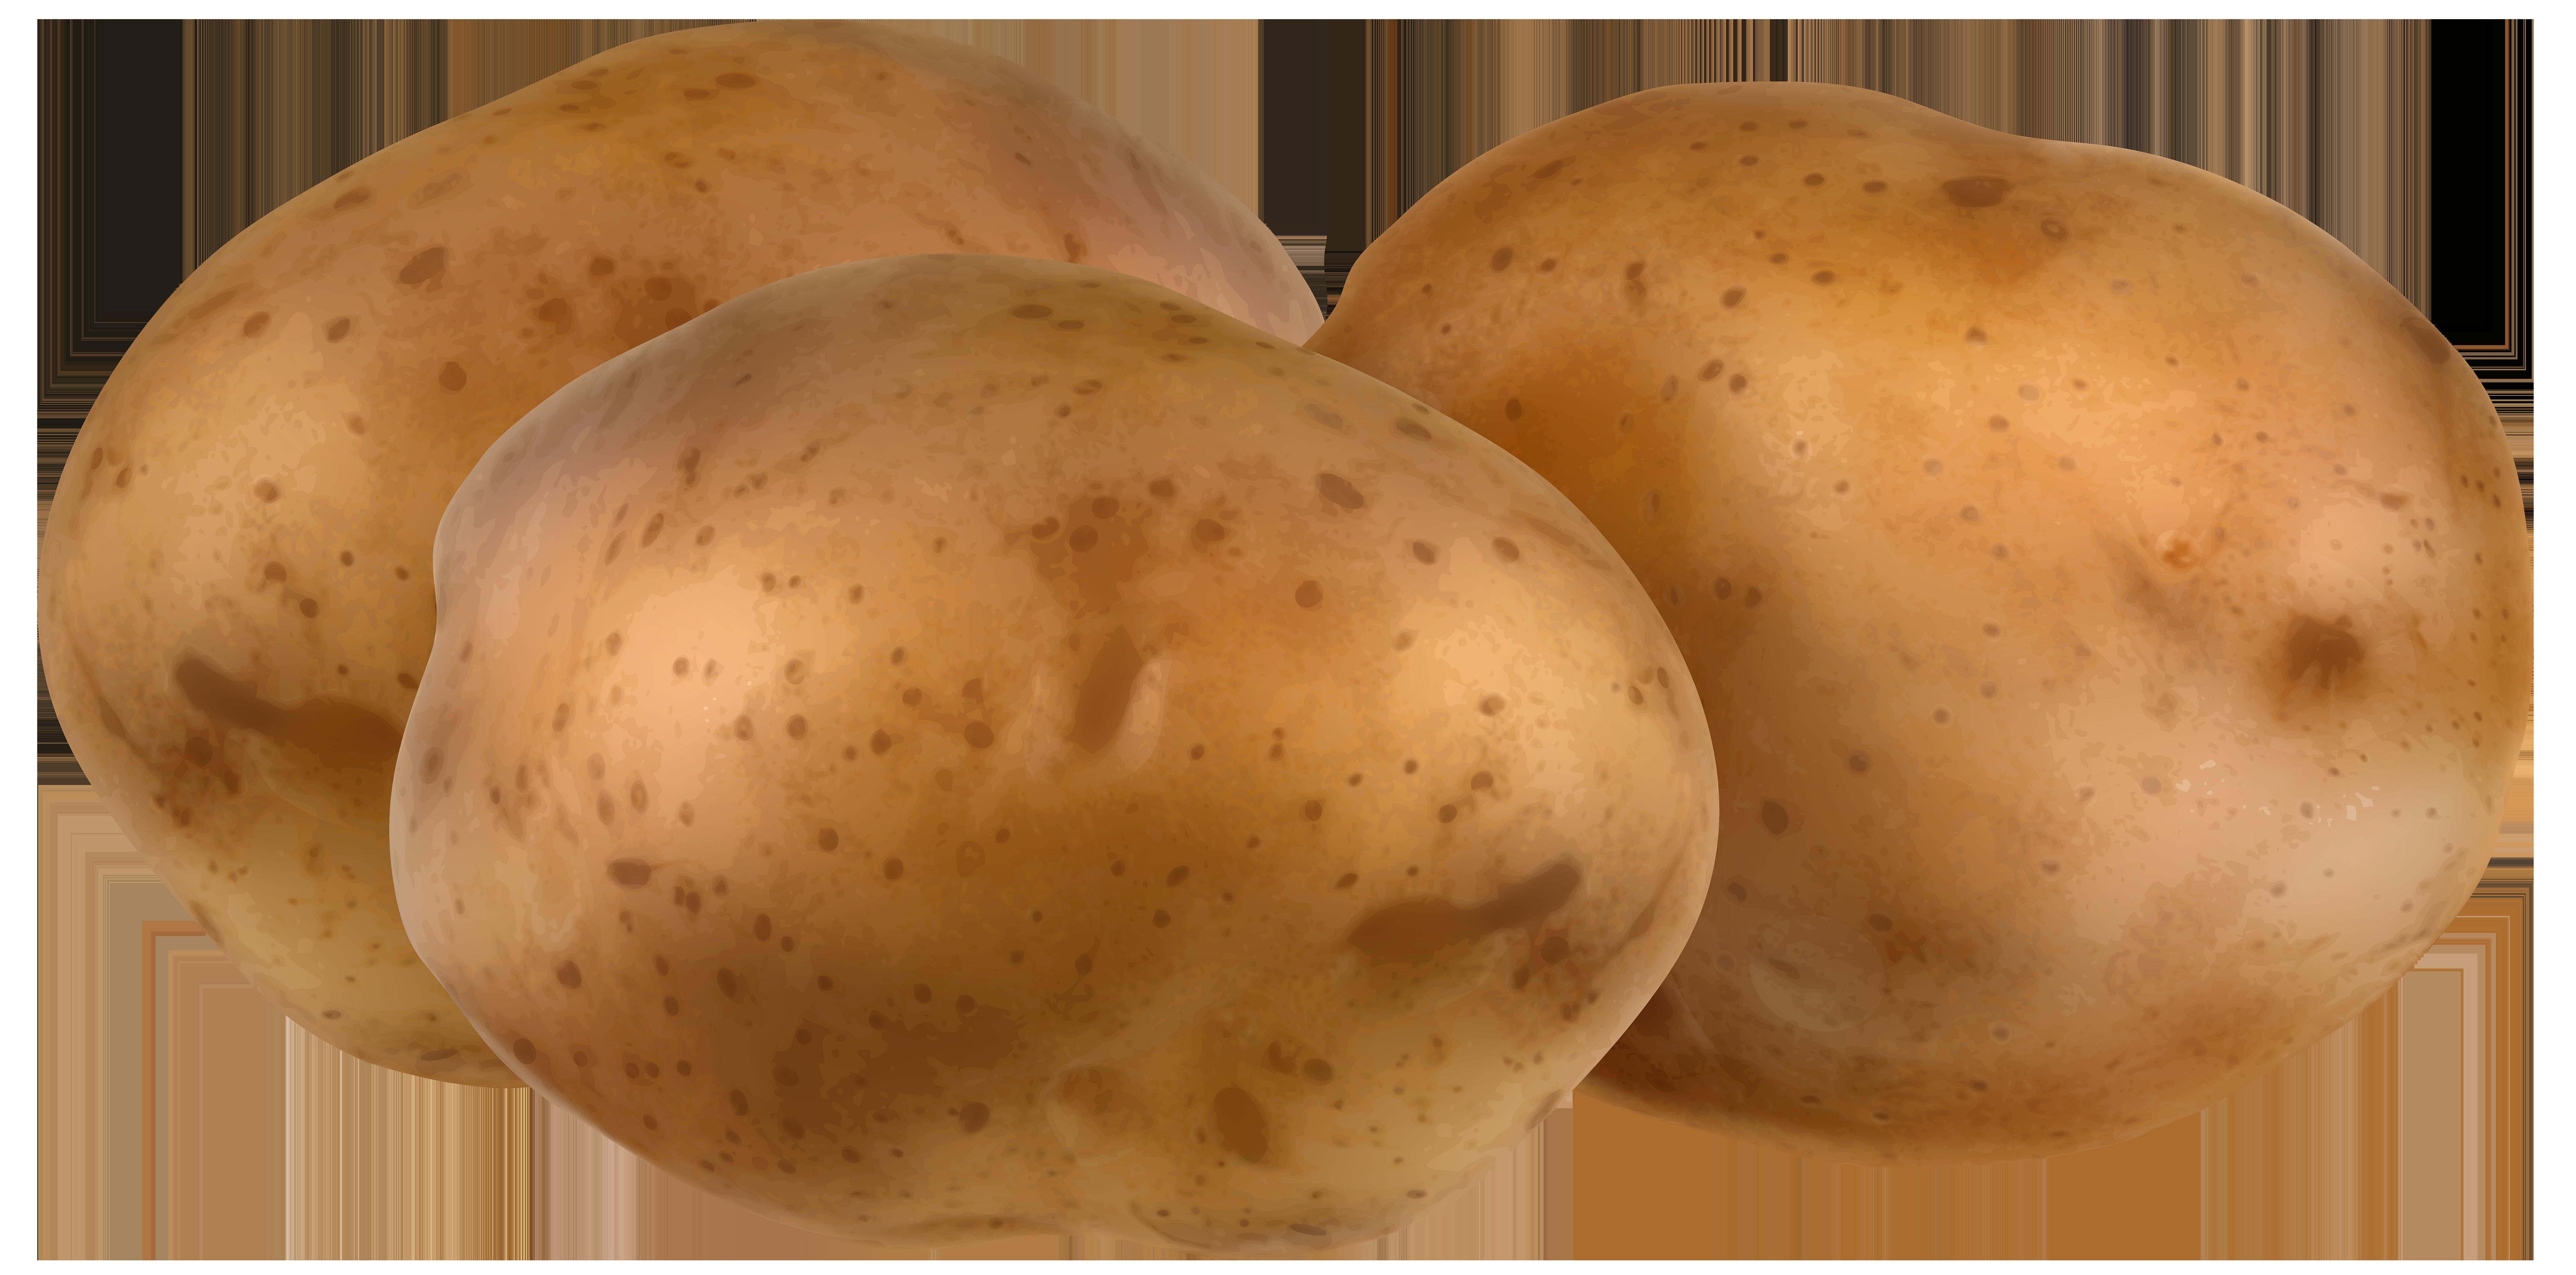 Potatoes transparent png clip. Potato clipart